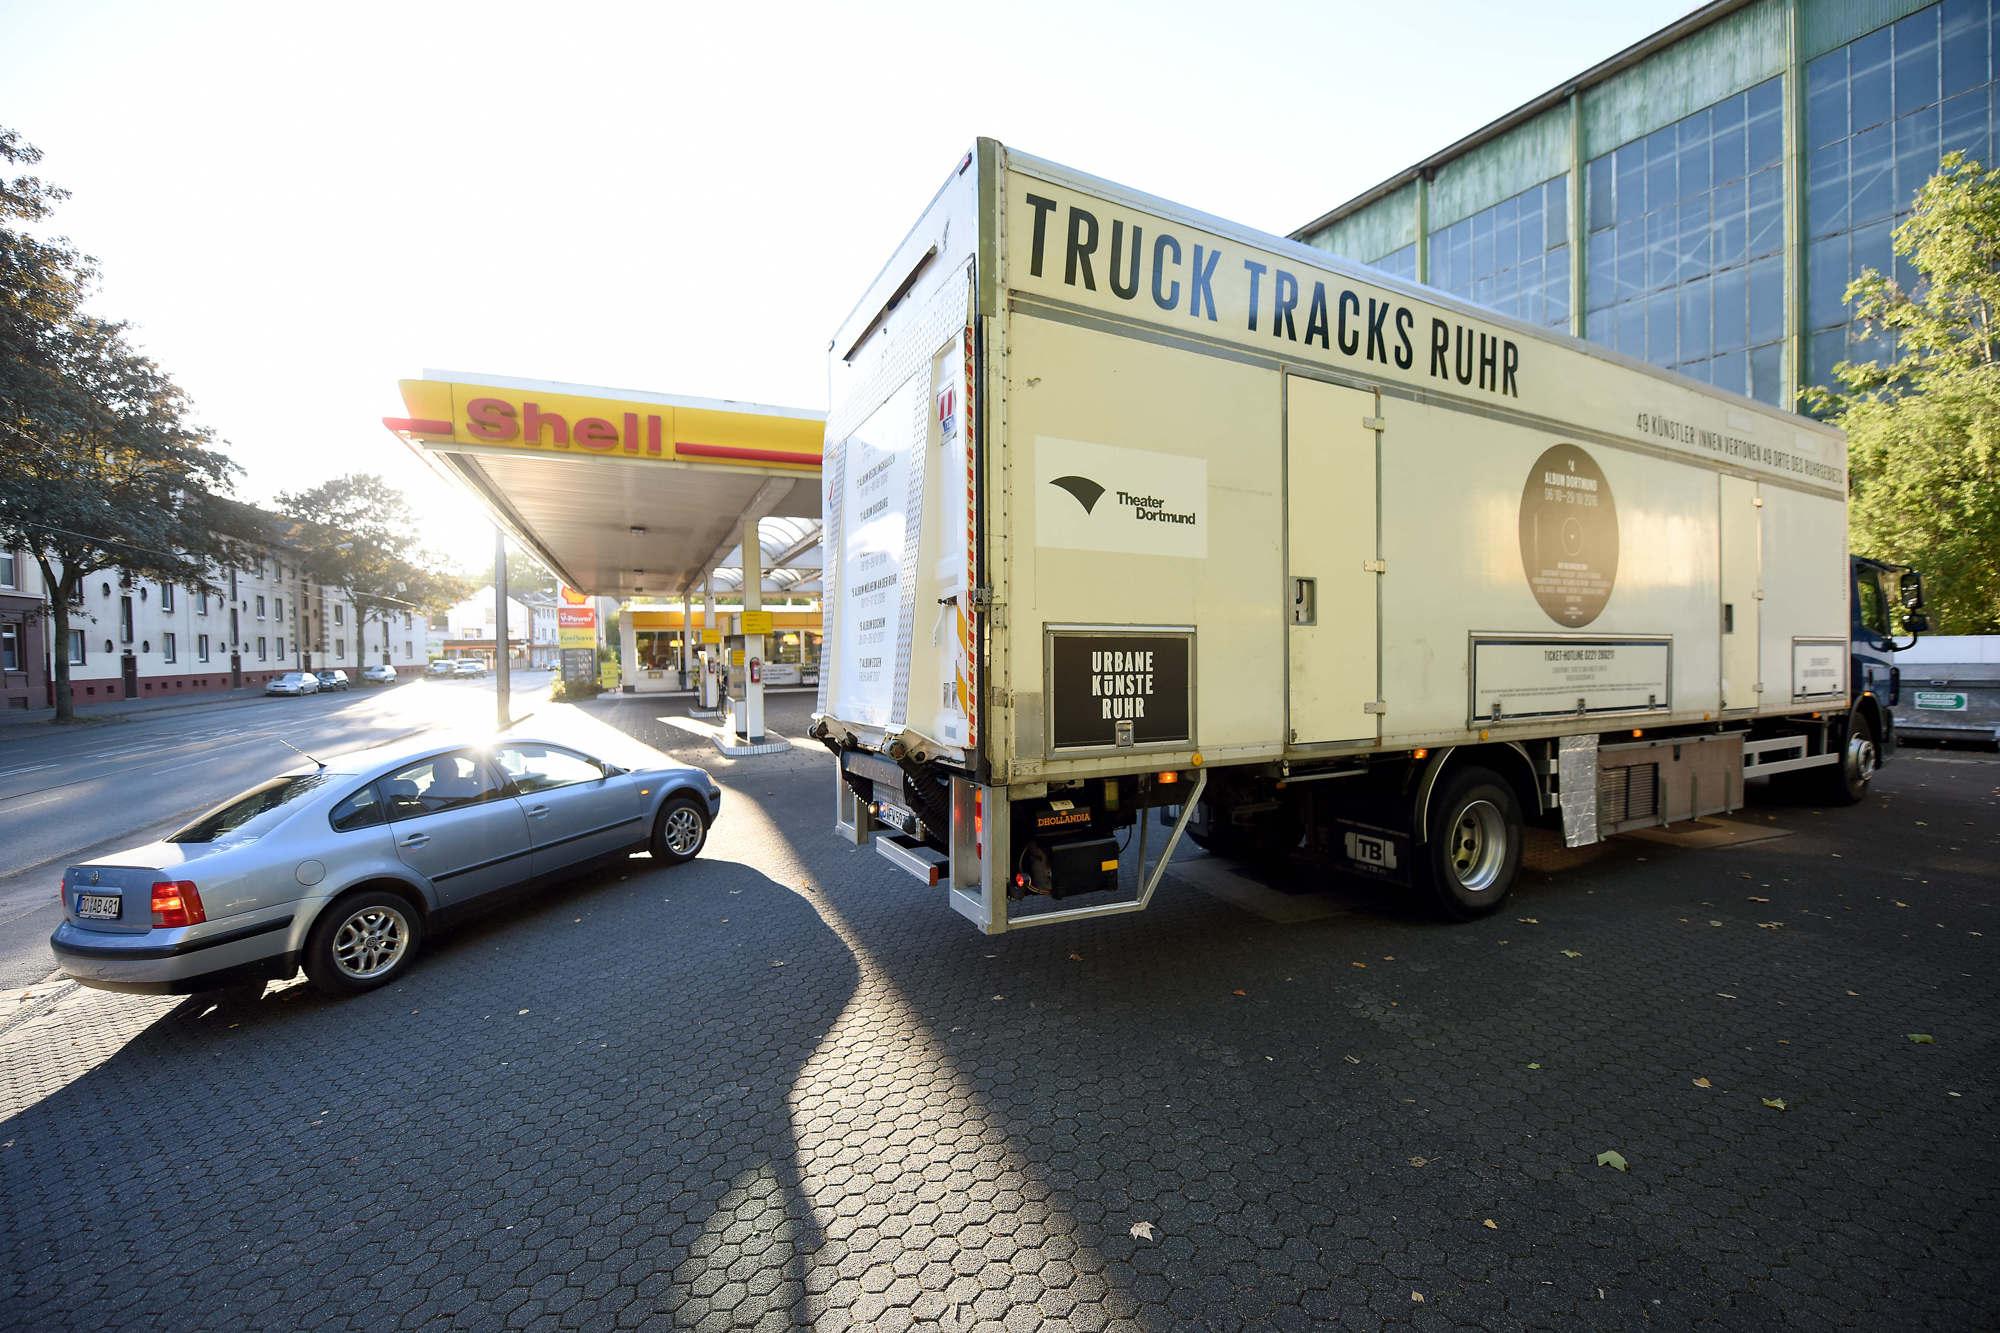 041016Truck_Dortmund_Netz038 (1).jpg